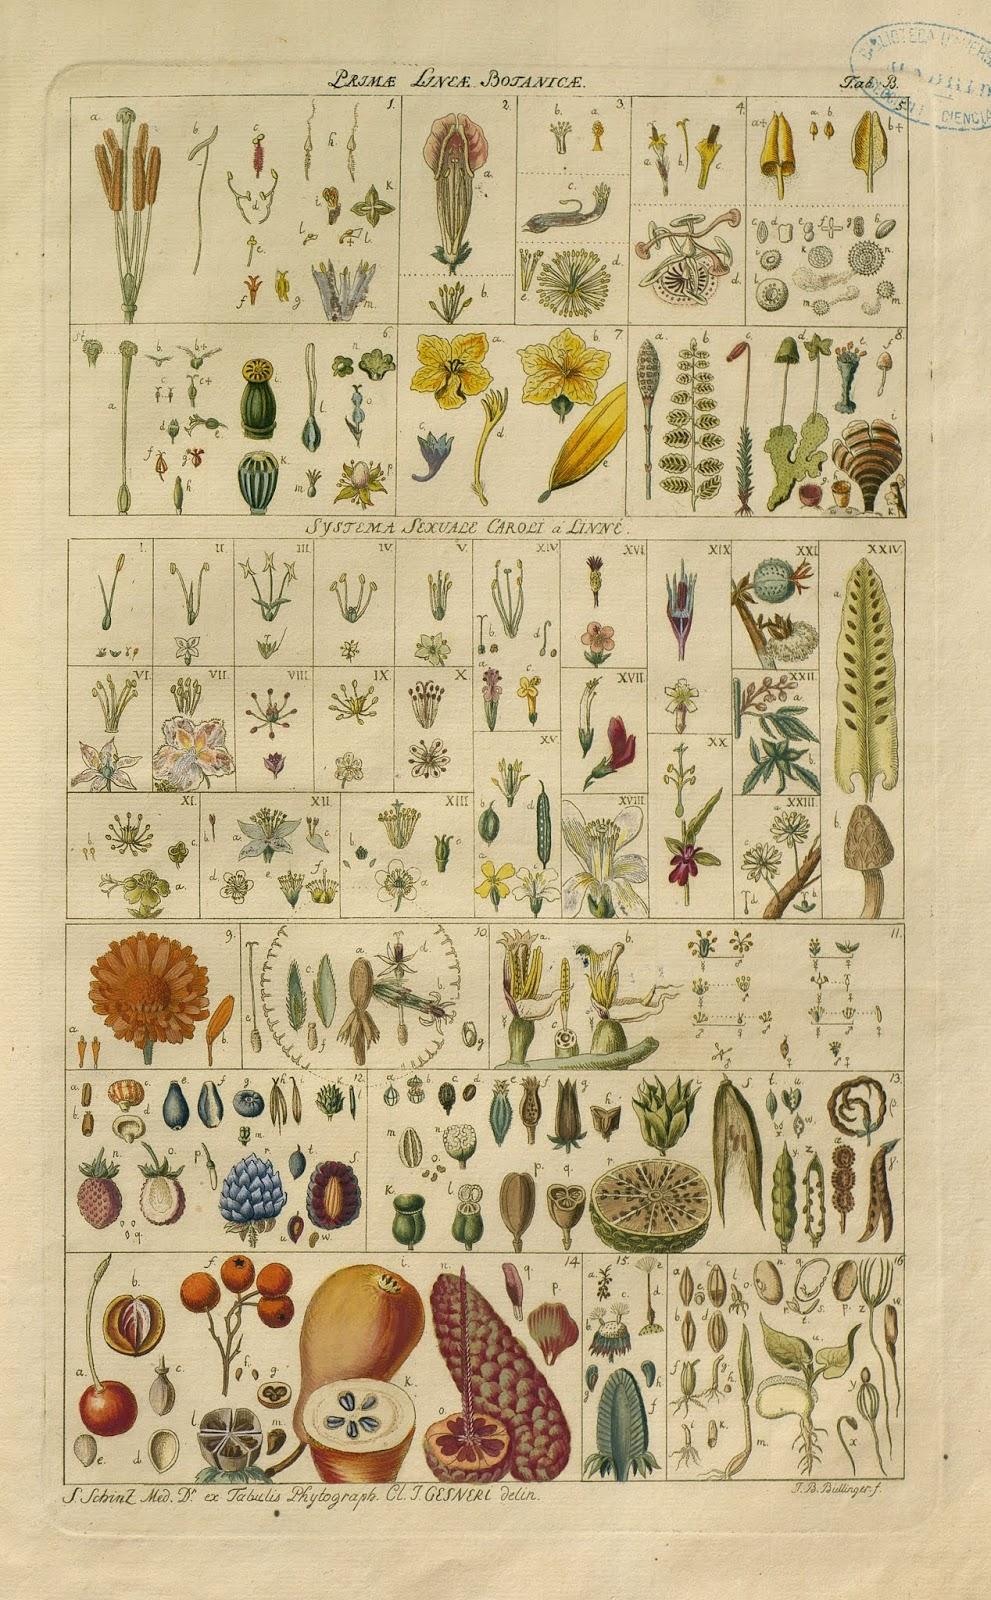 Cartel dibujos botánica reino vegetal colección Van Berkhey